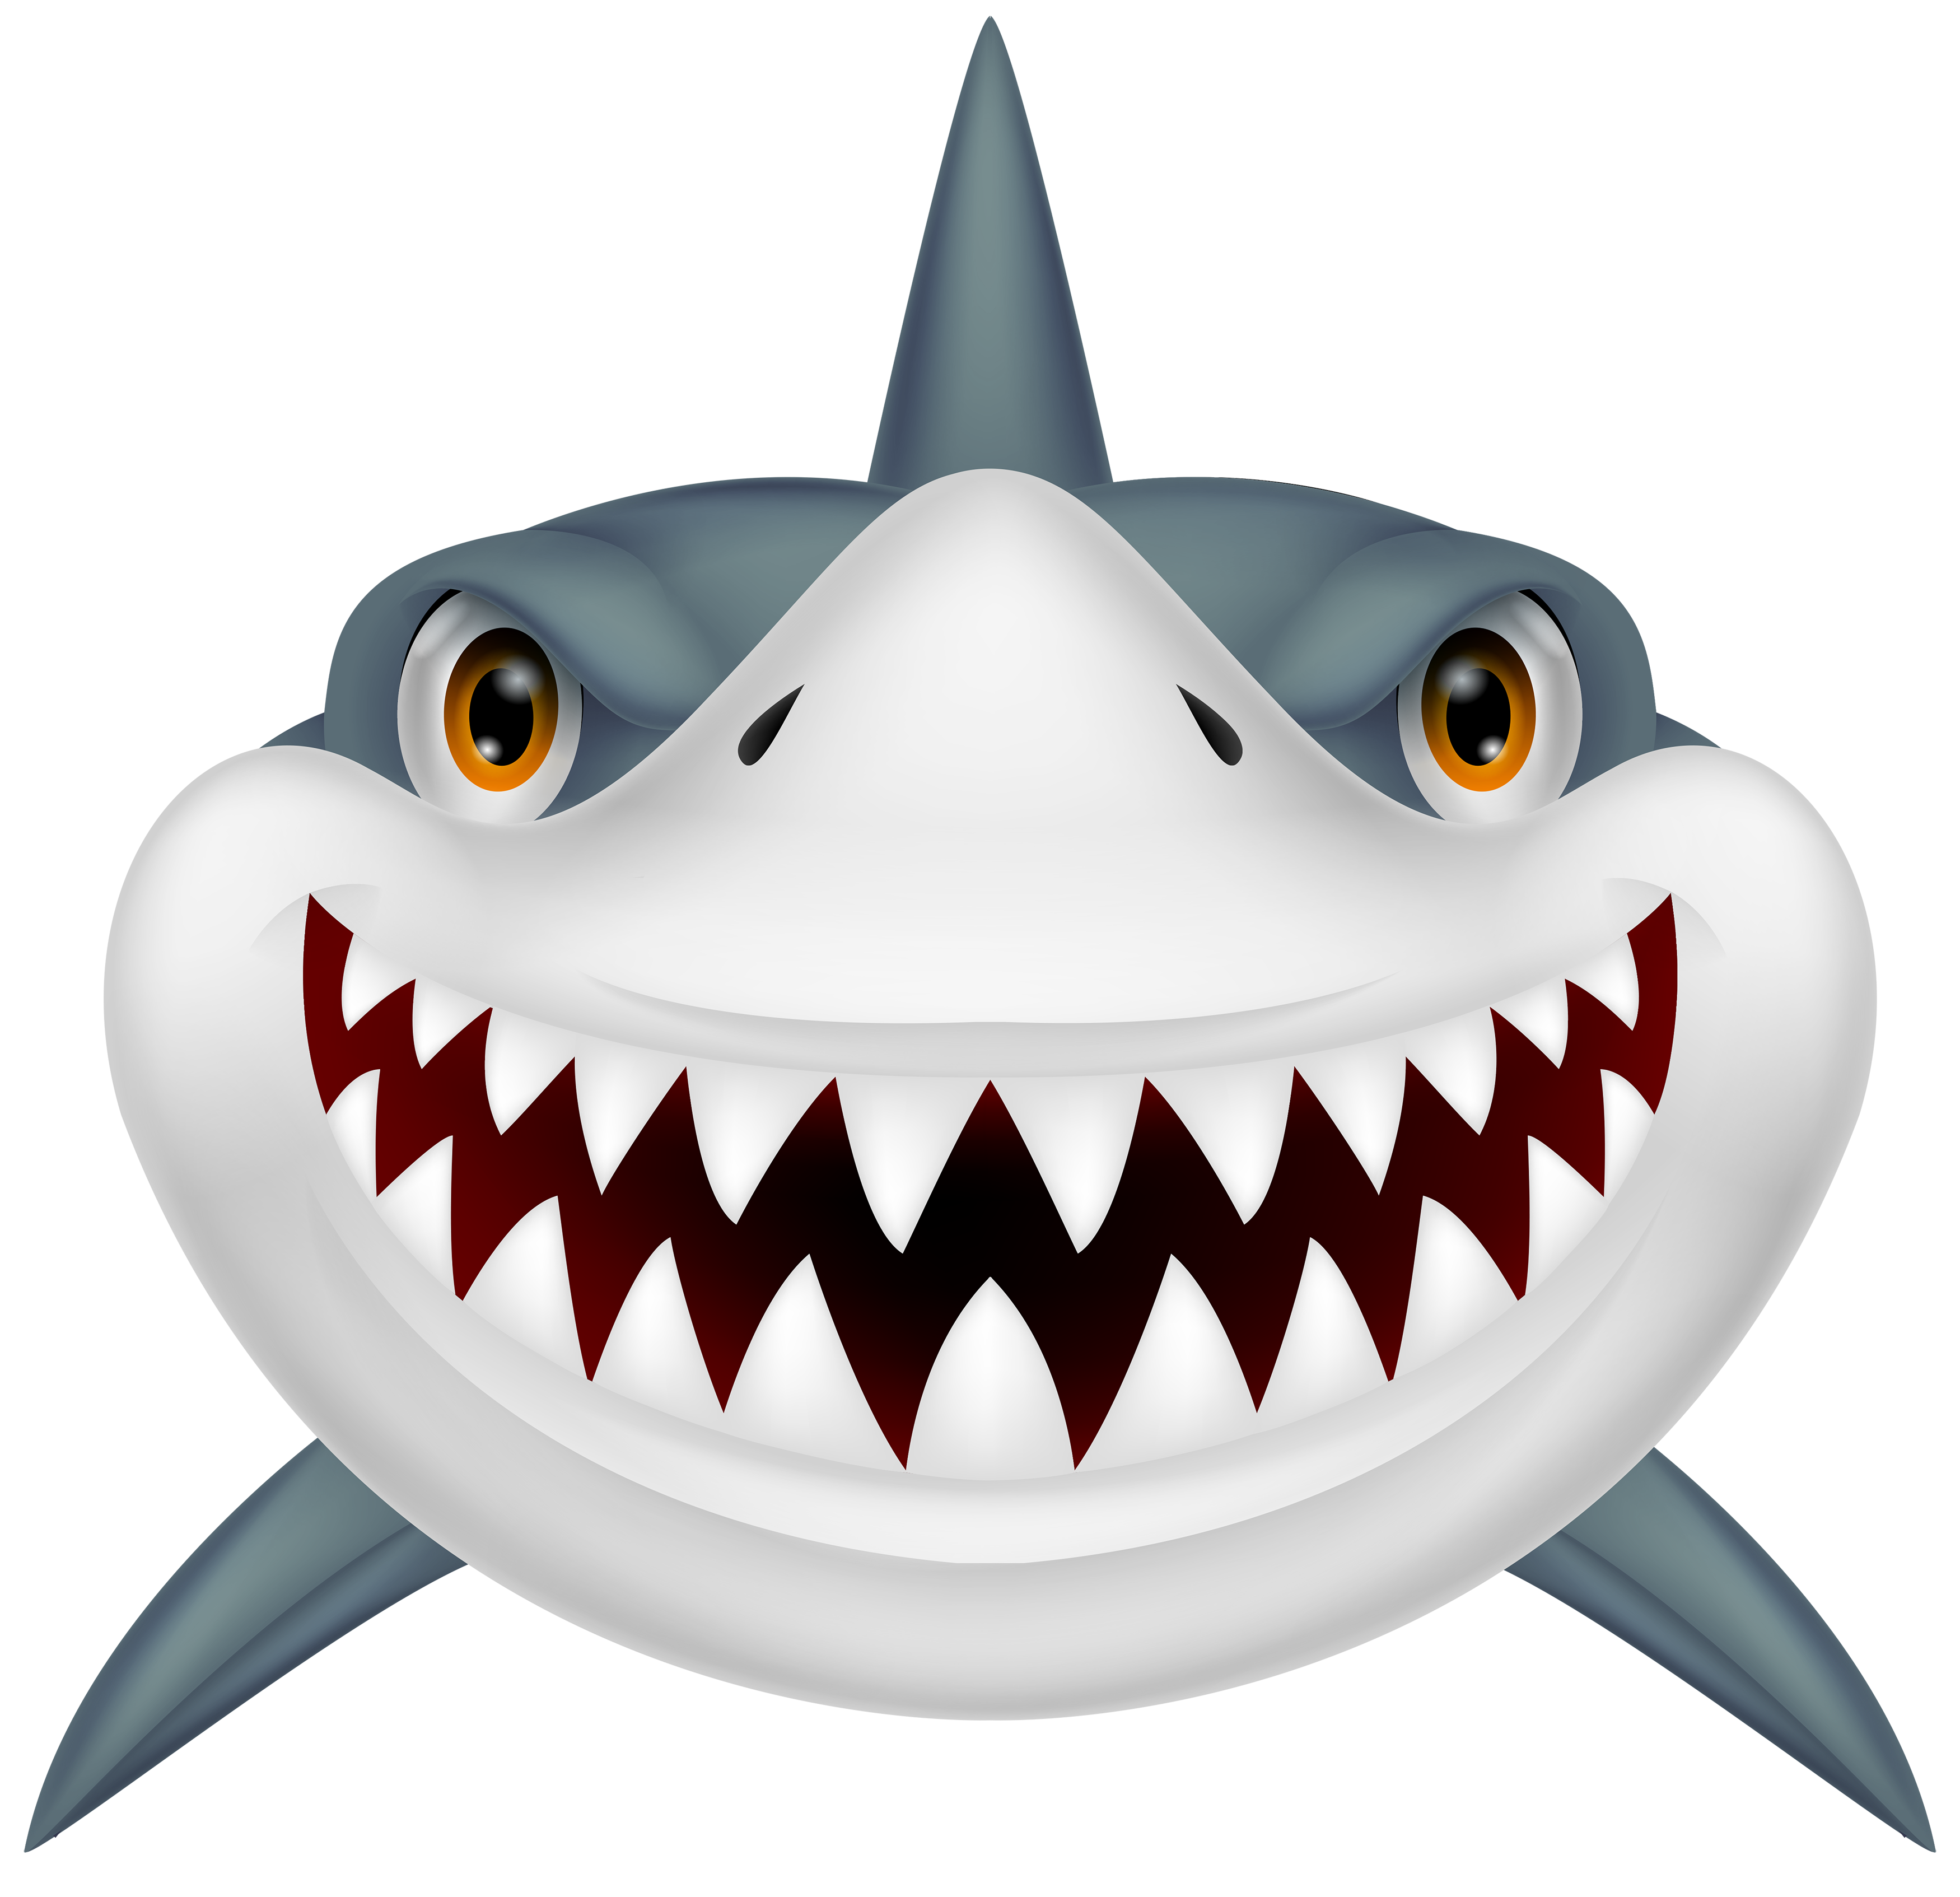 Shark clip art black and whit - Shark Clipart